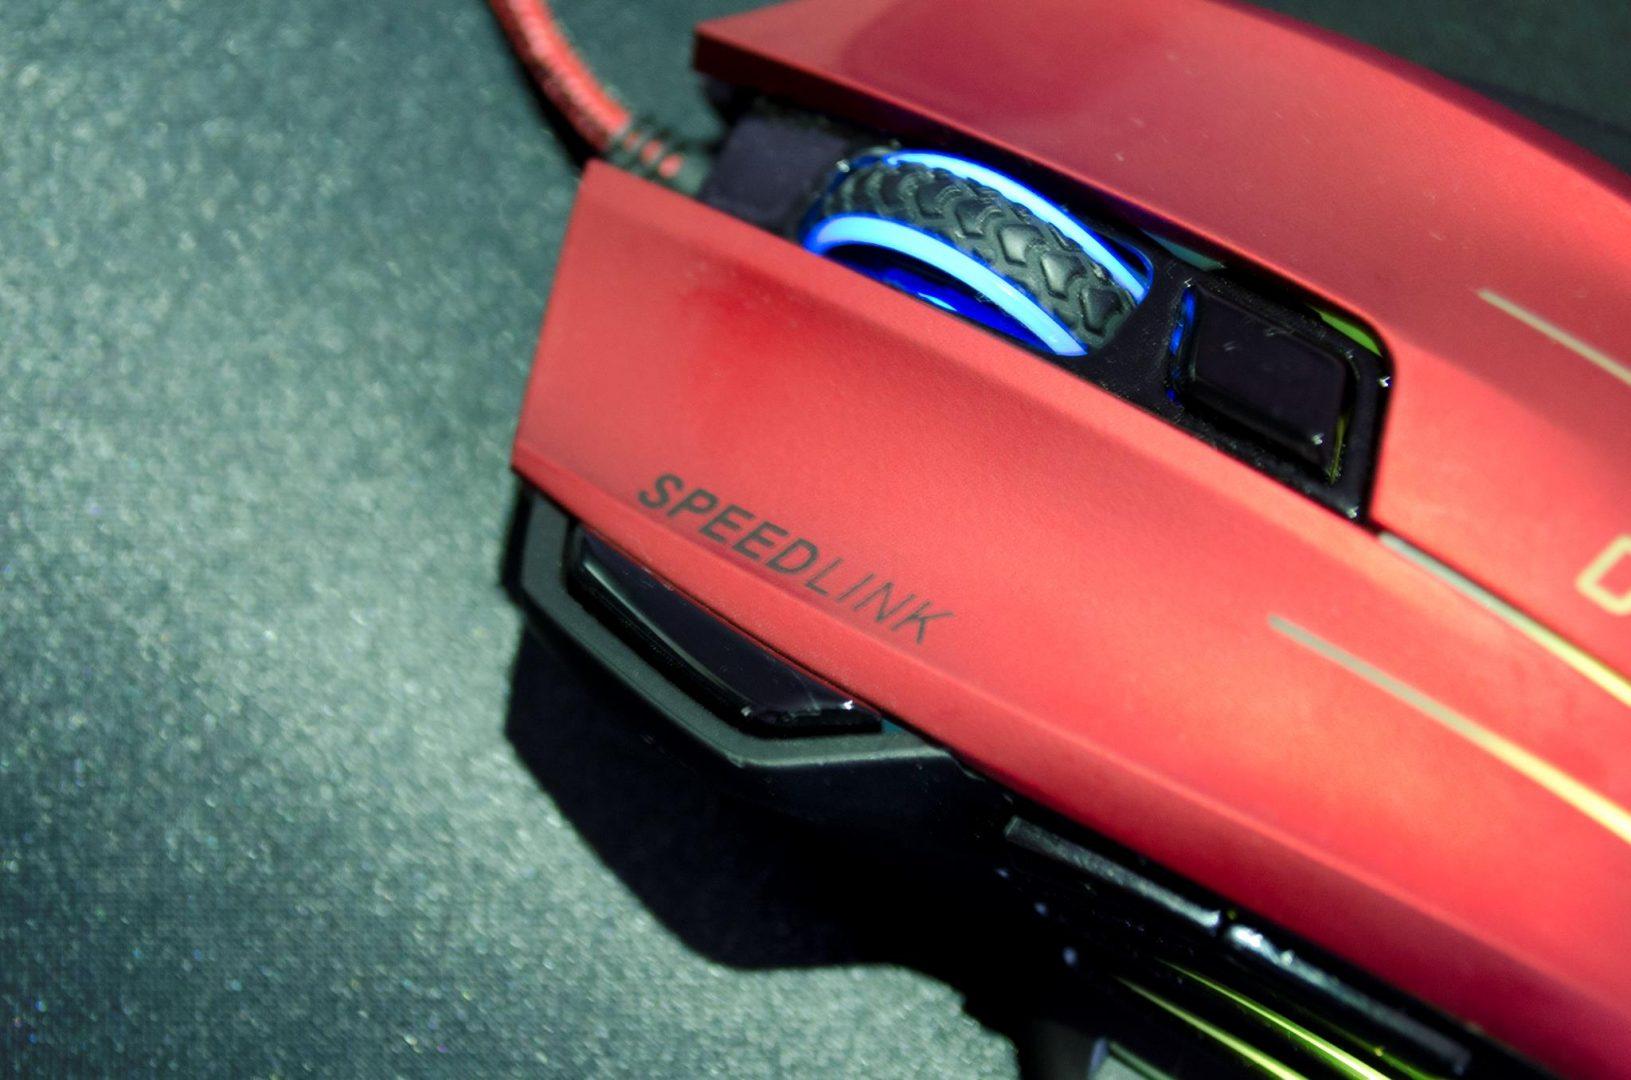 speedlink decus respec gaming mouse review_1